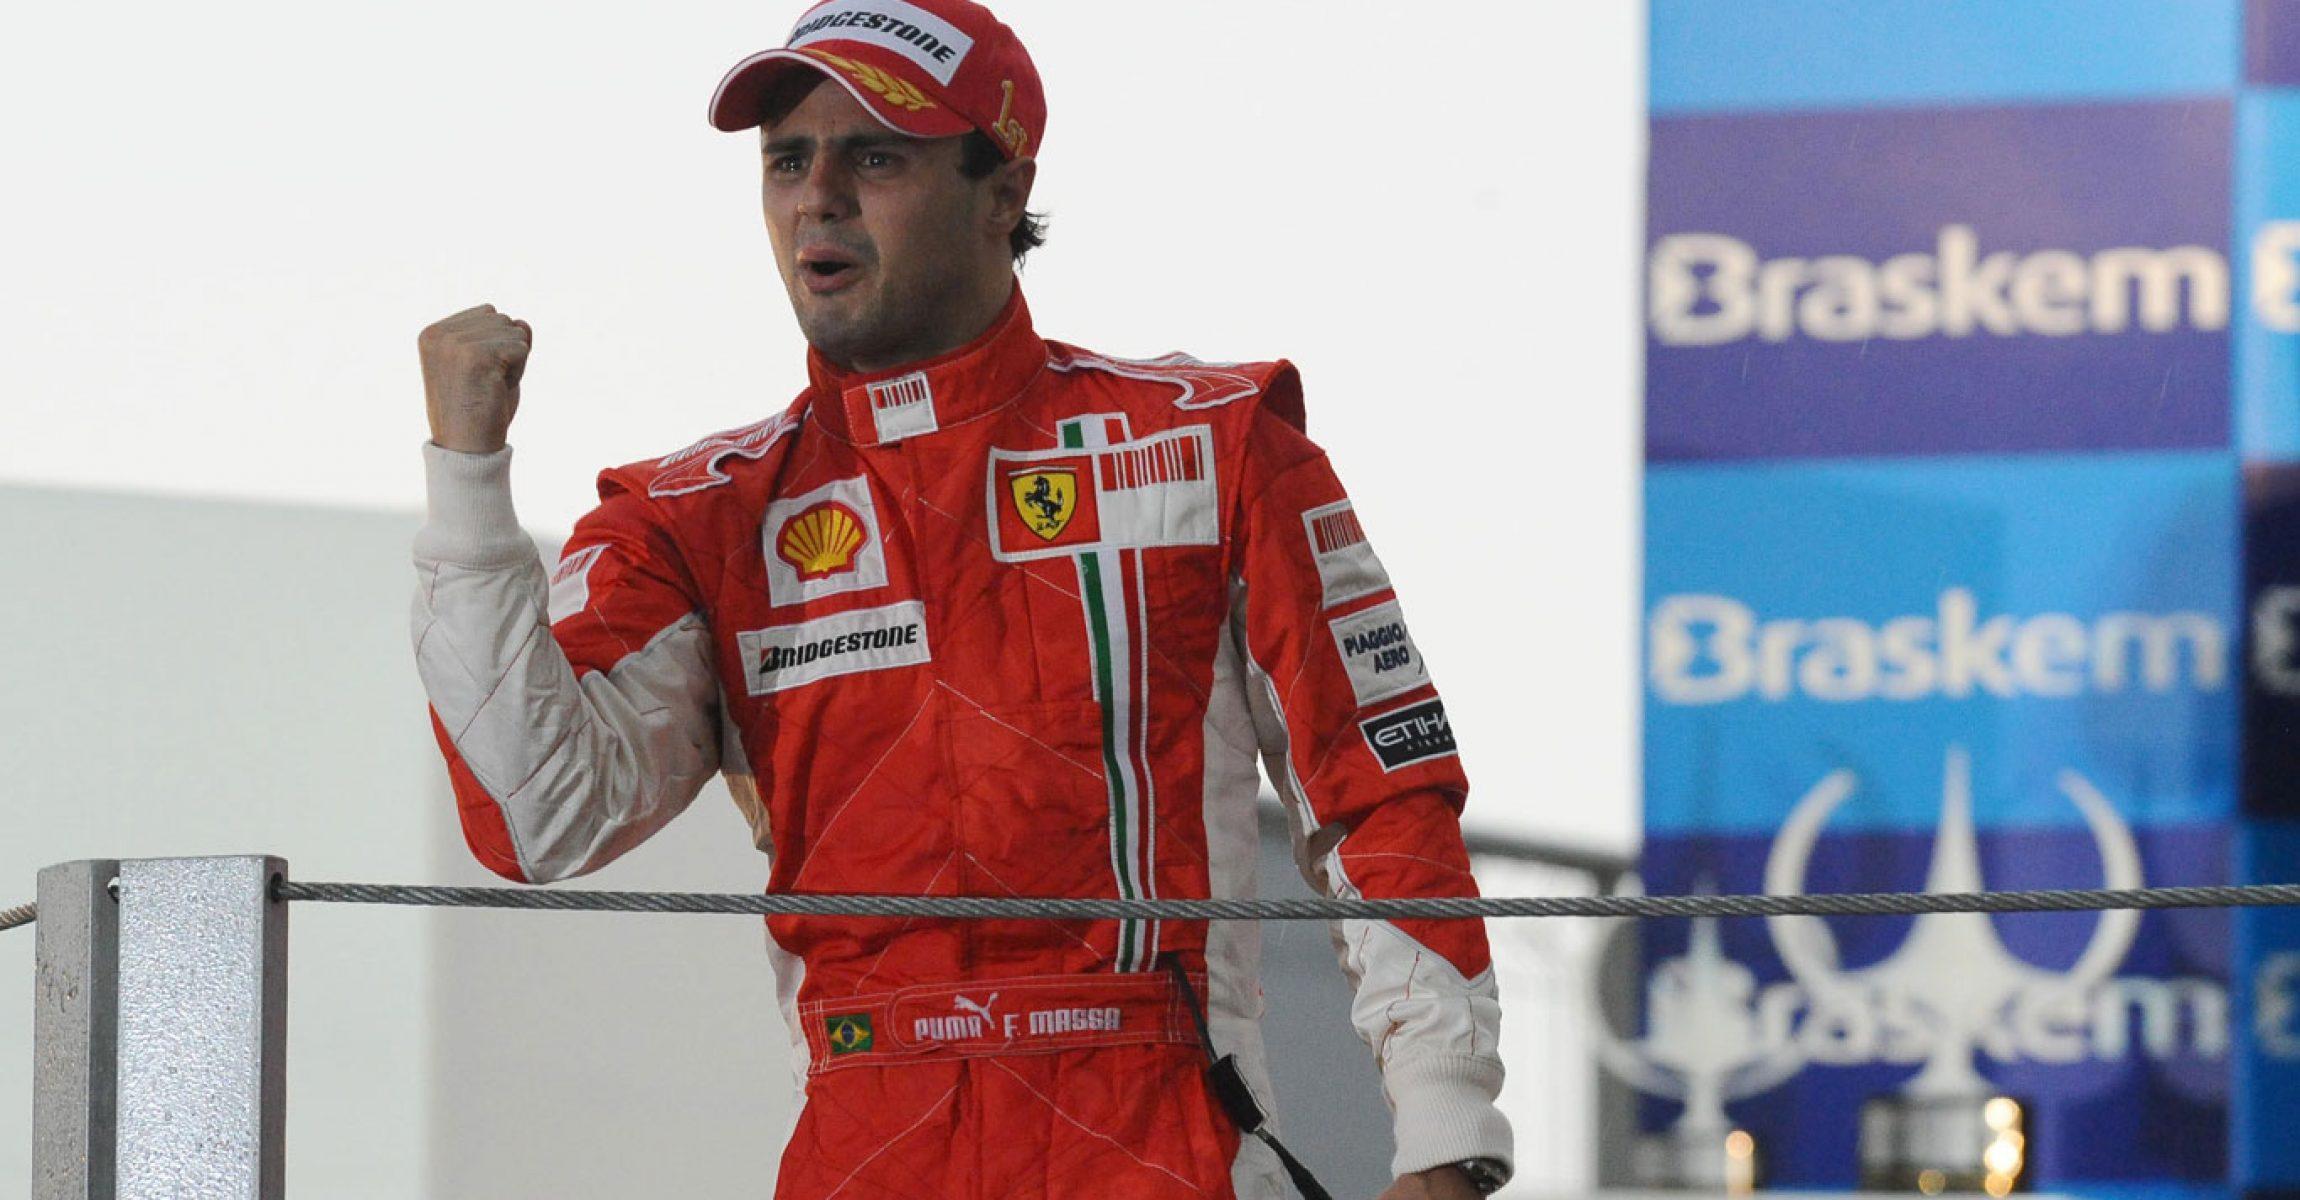 Felipe Massa 2008 Brazil GP Brasil GP Scuderia Ferrari